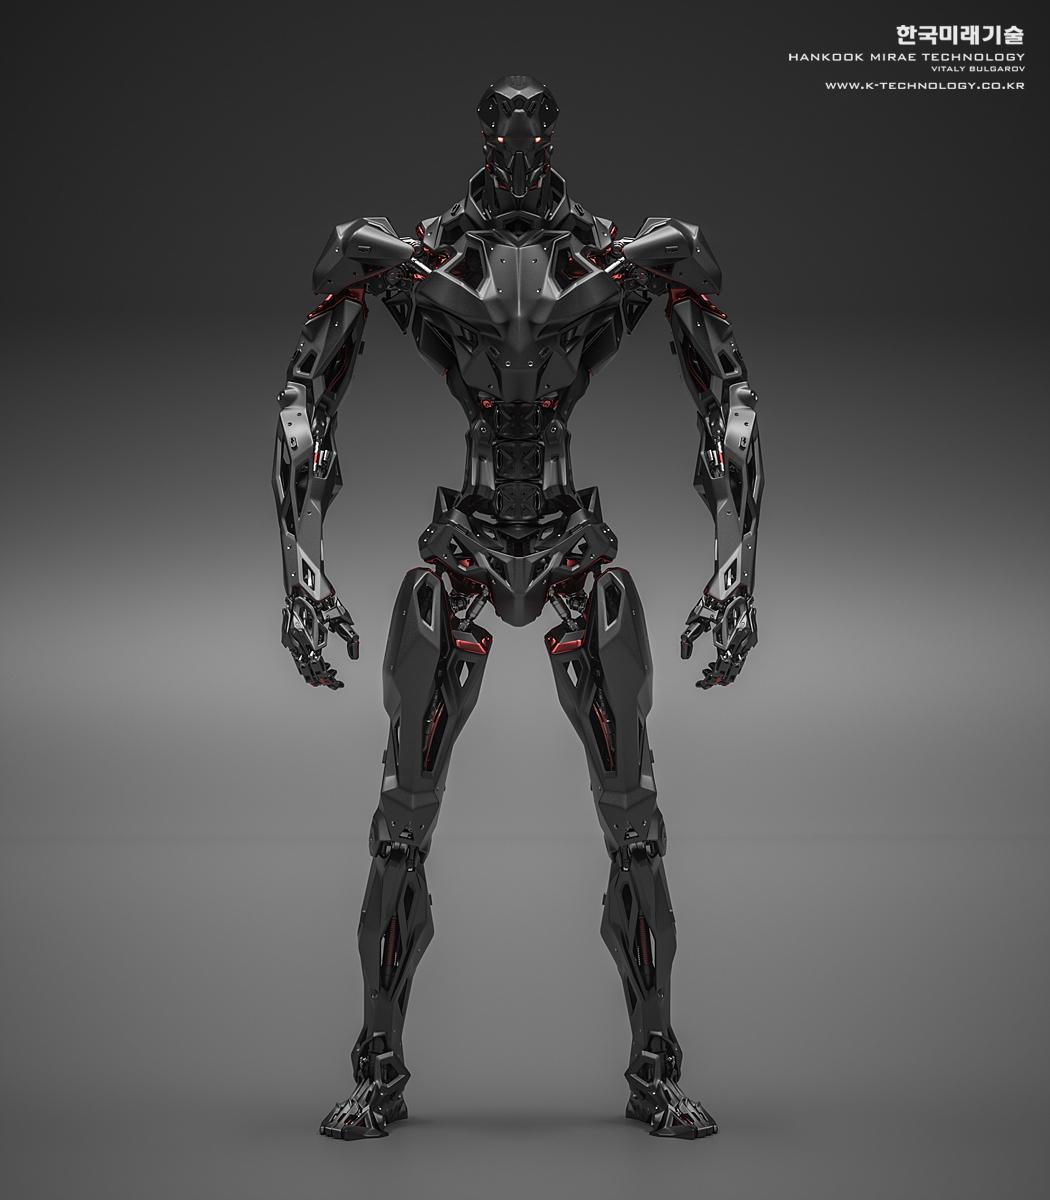 KFT_2.Xm_RobotDesign_ (23 of 29).jpg